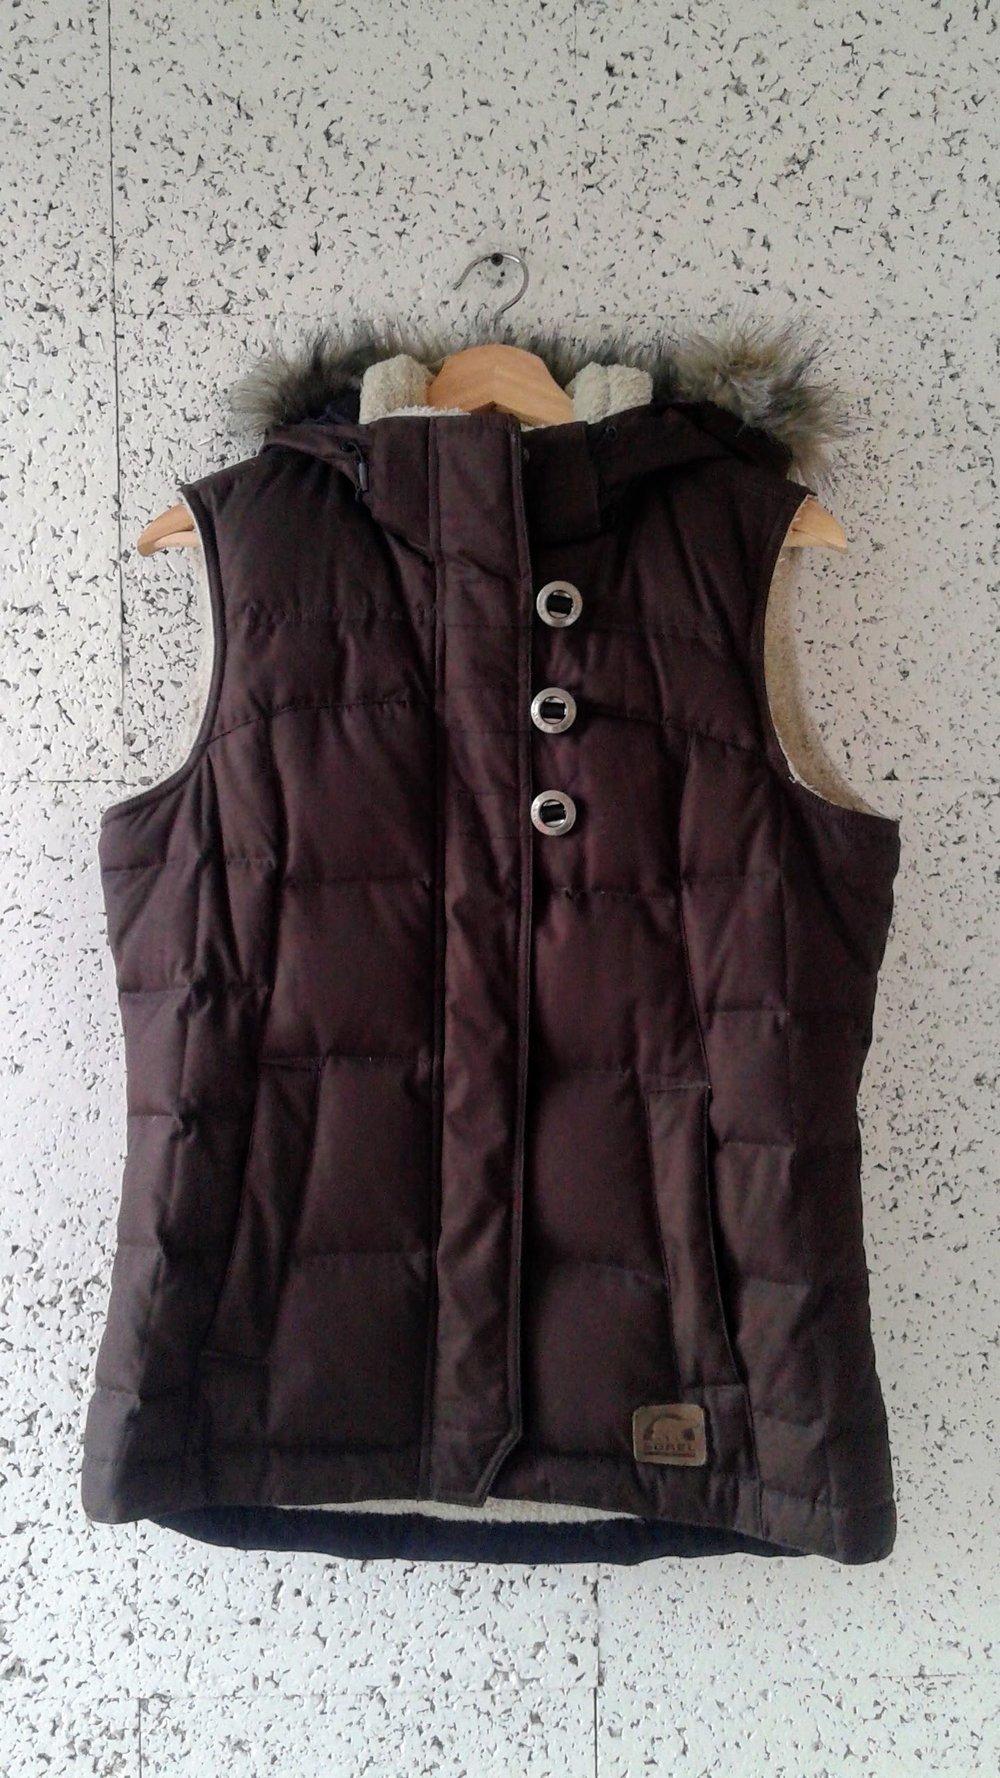 Sorel vest; Size S, $42